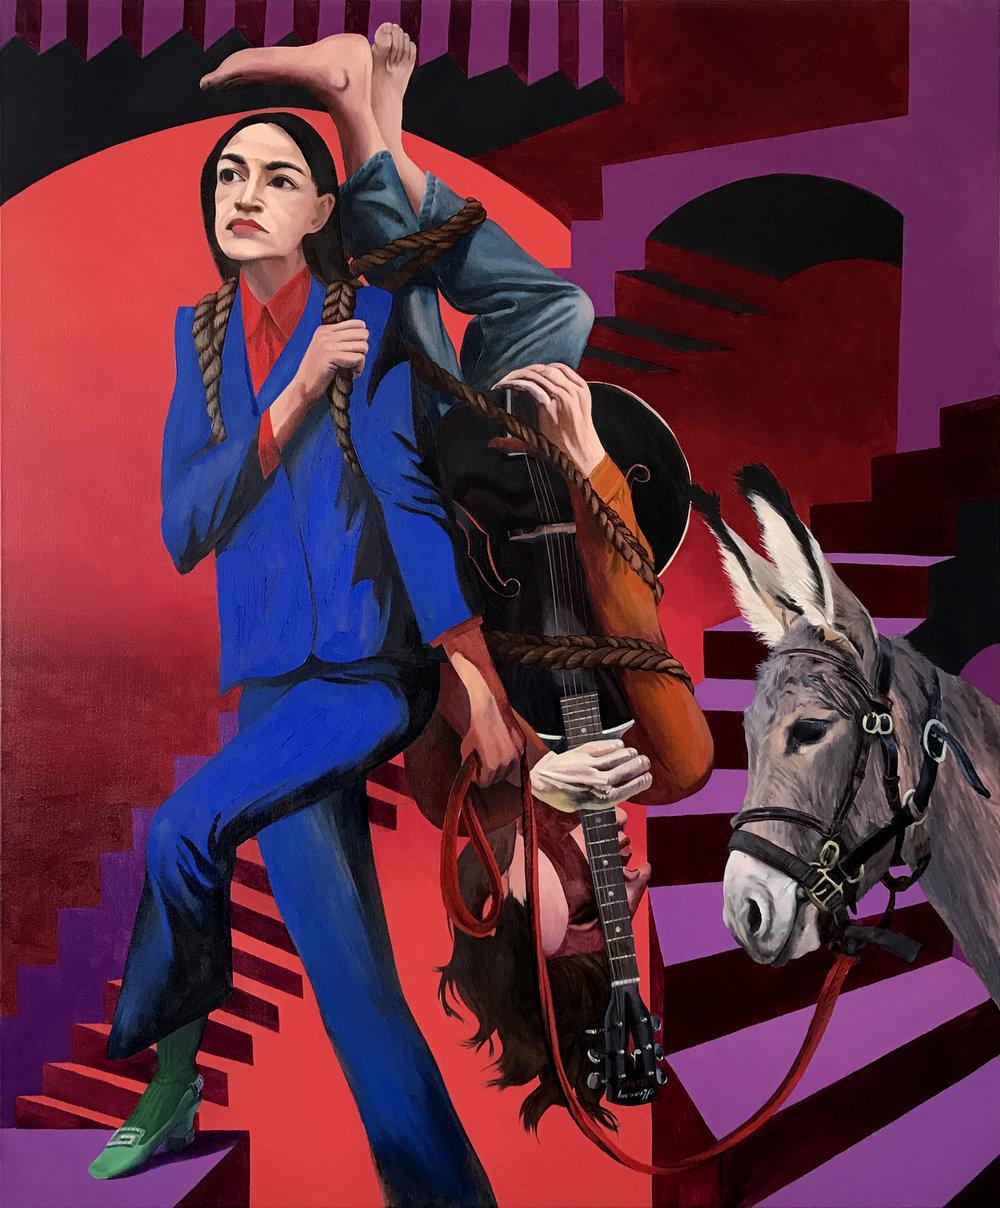 Justin John Greene   Deposition  2019 Oil on canvas 127 x 107 cm  Available